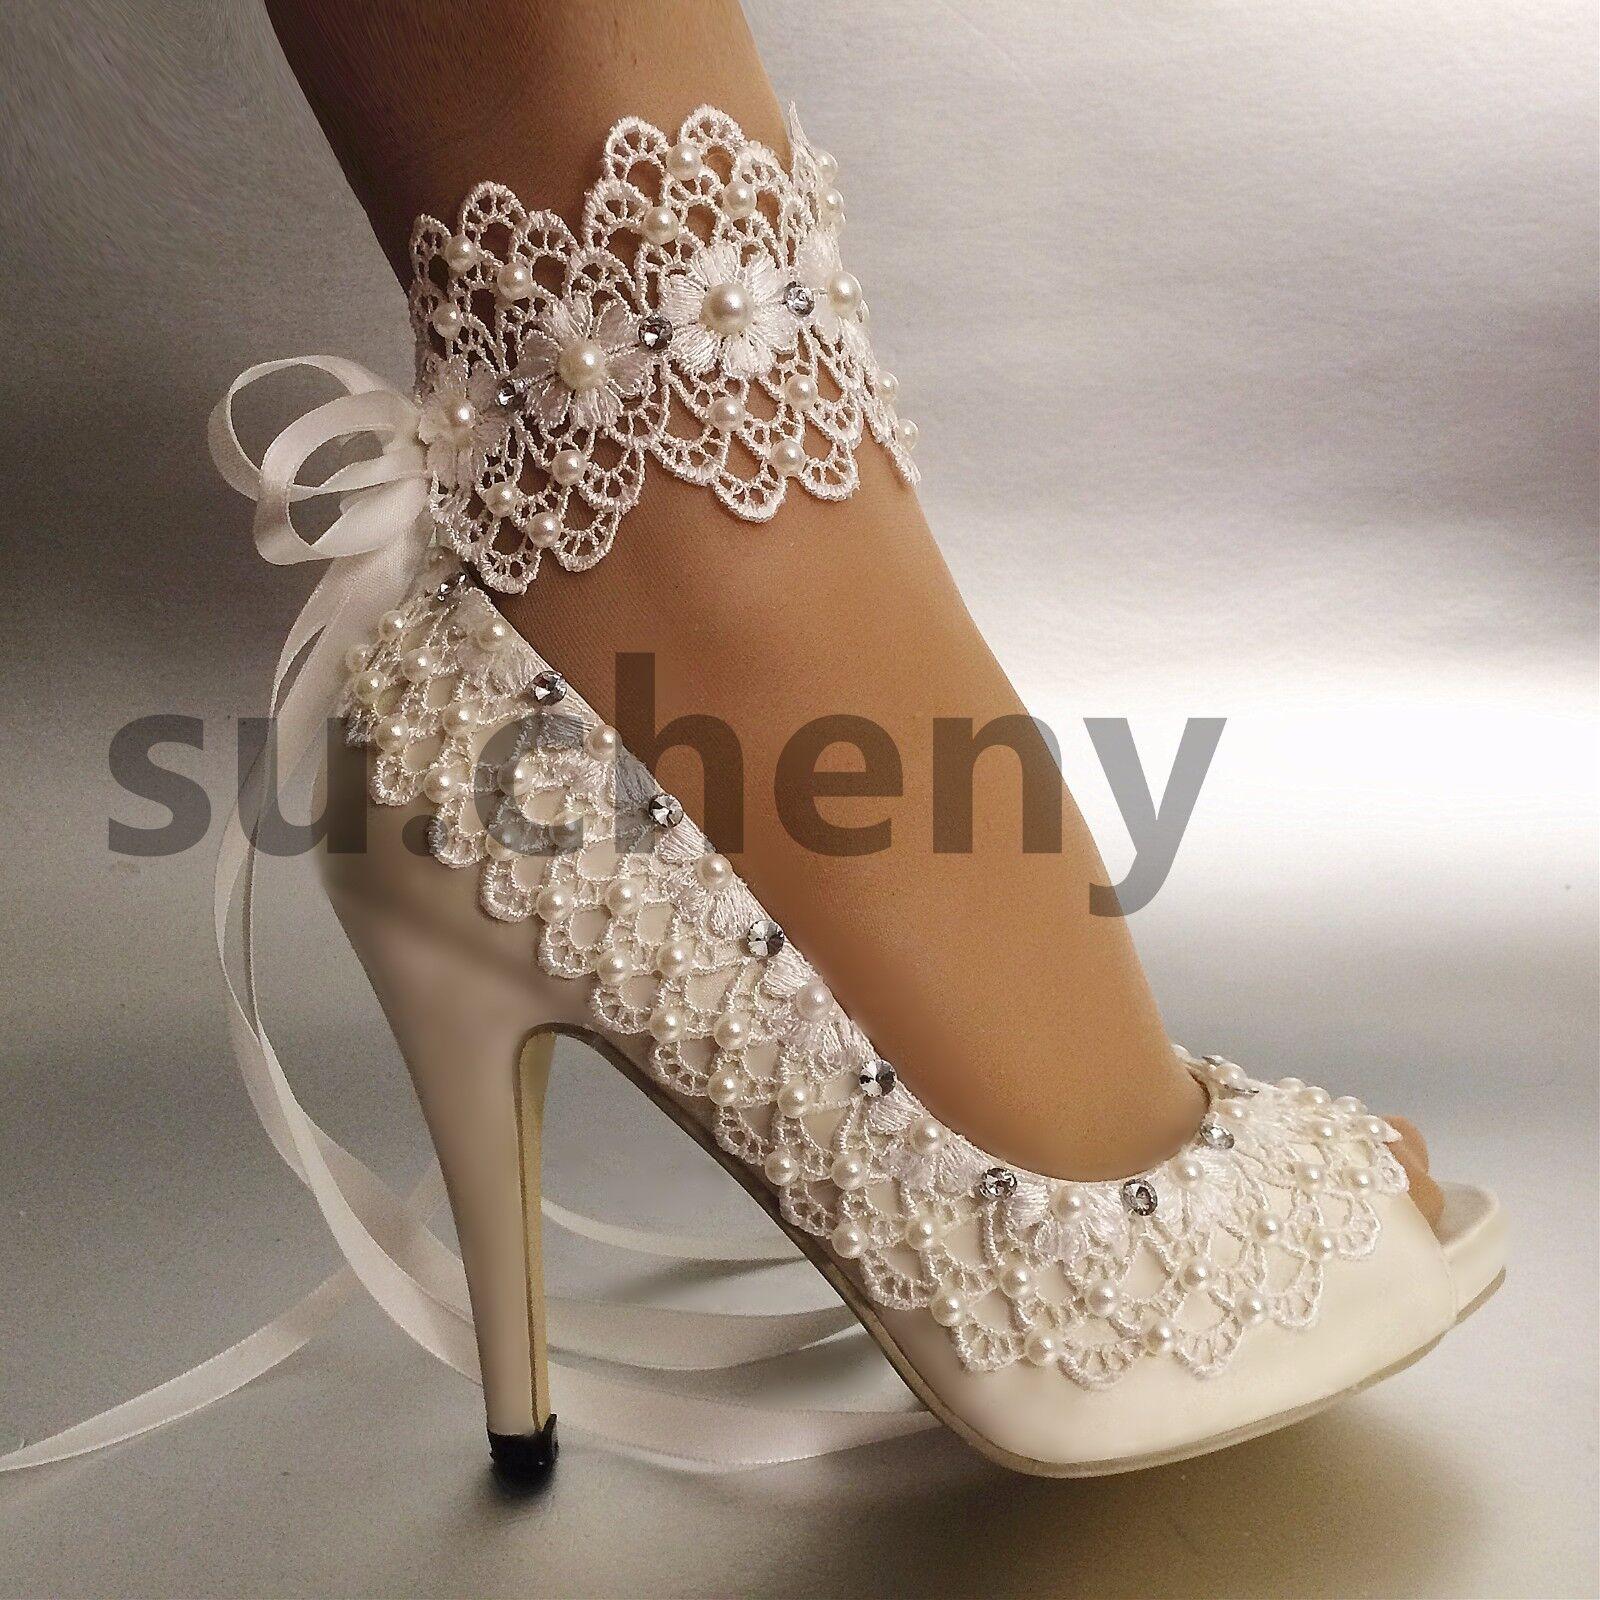 su.cheny Open toe 3